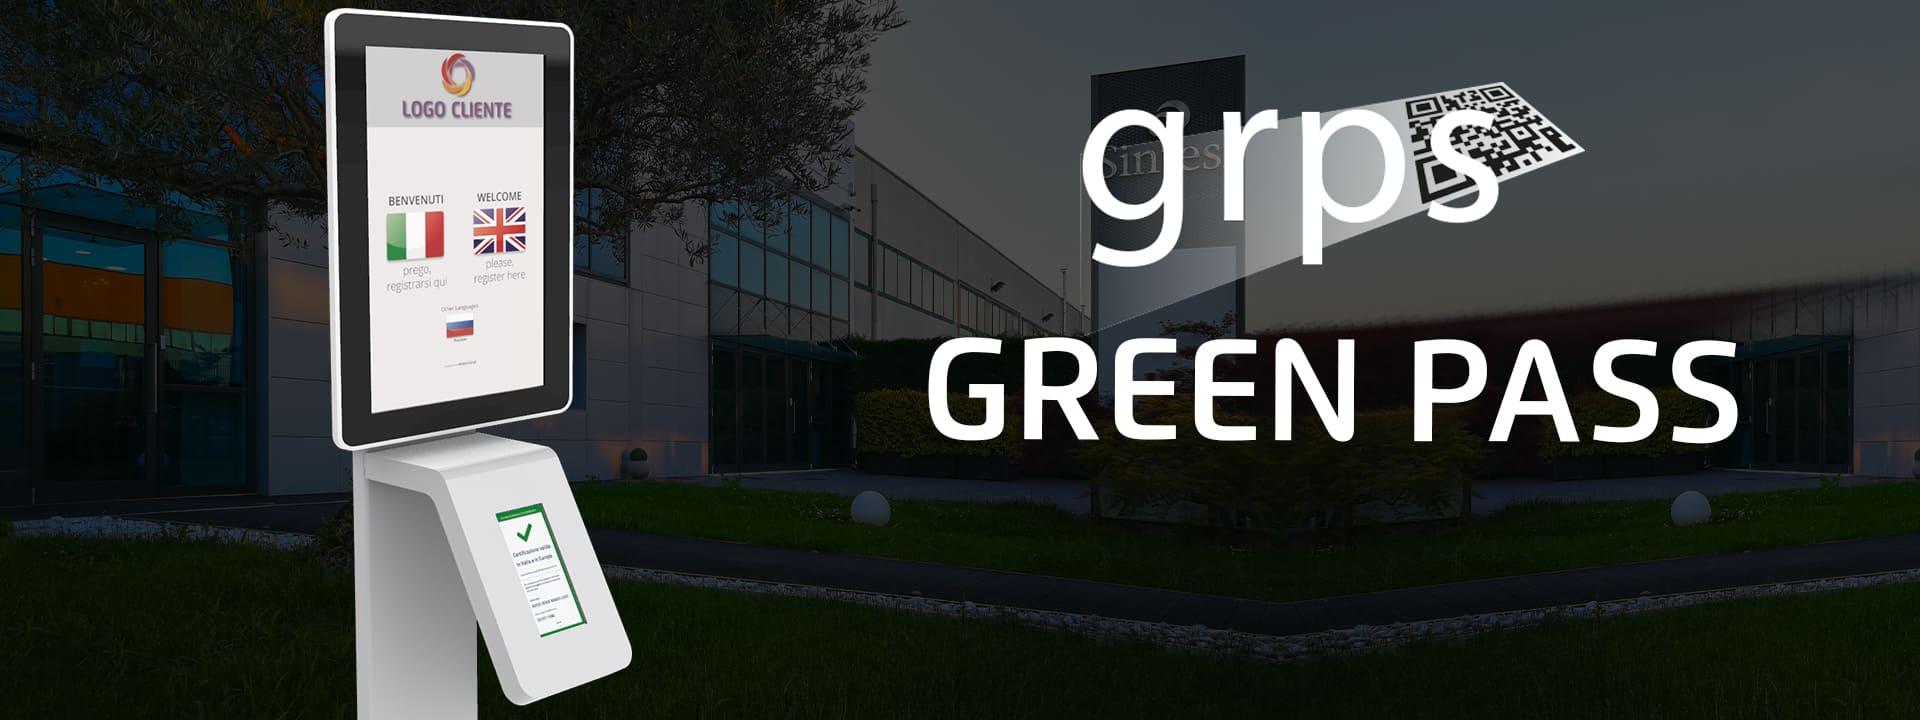 grps-green-pass